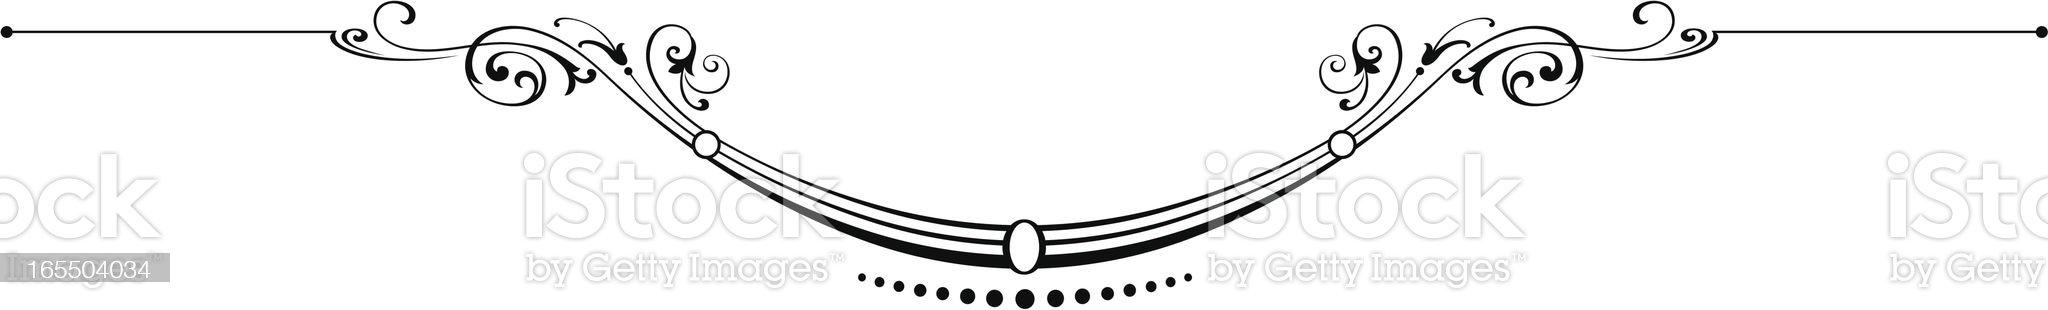 Elegante Ruleline royalty-free stock vector art